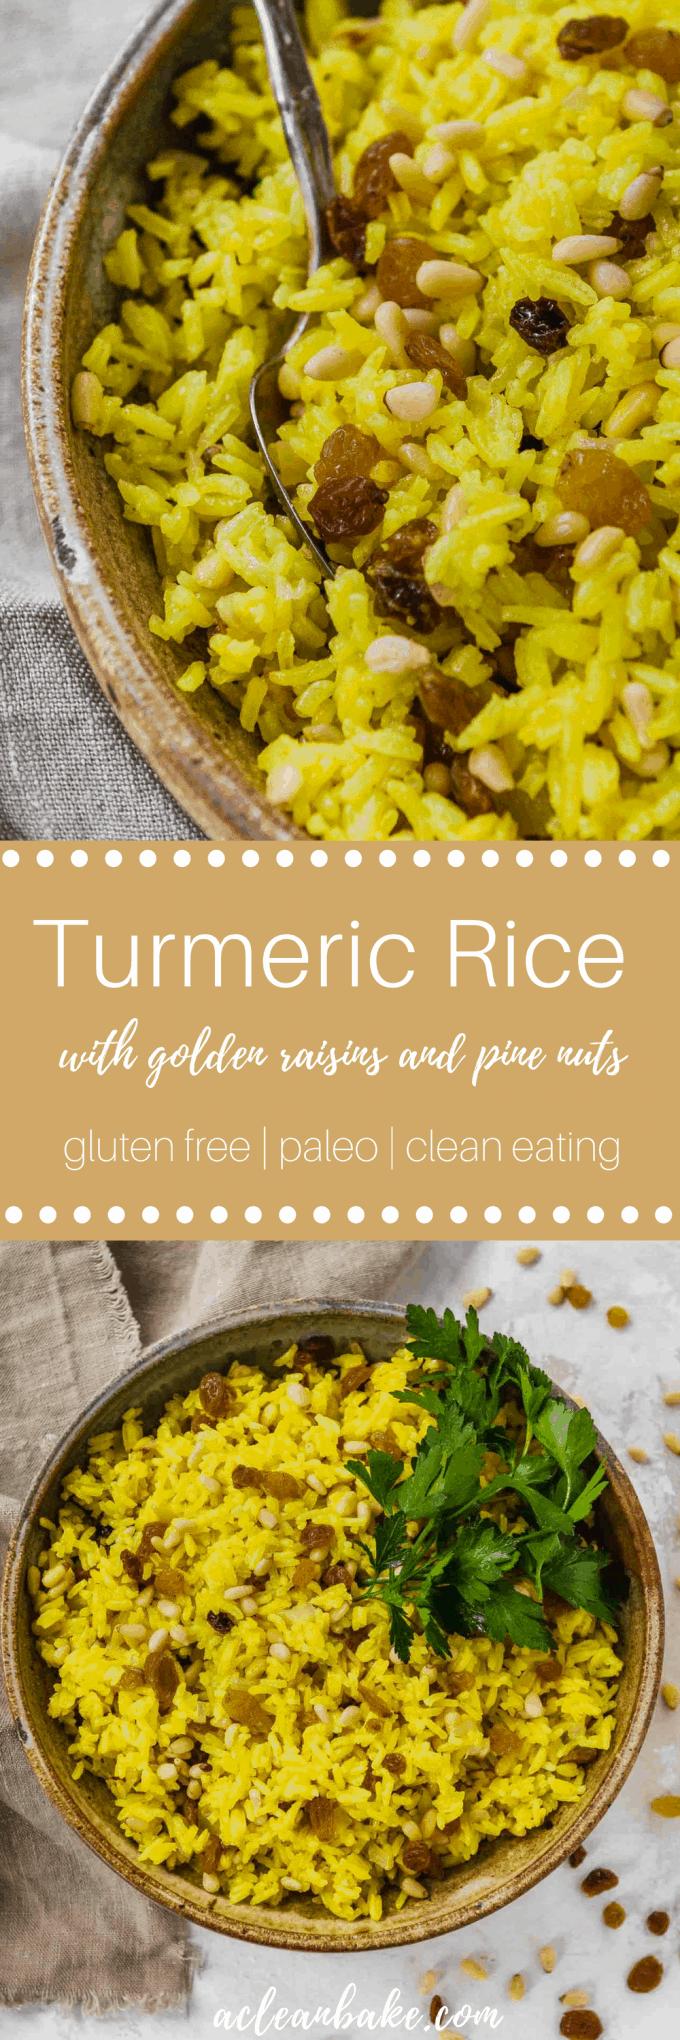 Turmeric Rice with Golden Raisins and Pine Nuts #glutenfree #glutenfreedinner #sidedish #glutenfreerecipe #paleo #Paleorecipes #Paleorecipe #paleosidedish #turmeric #antiinflammatory #superfoods